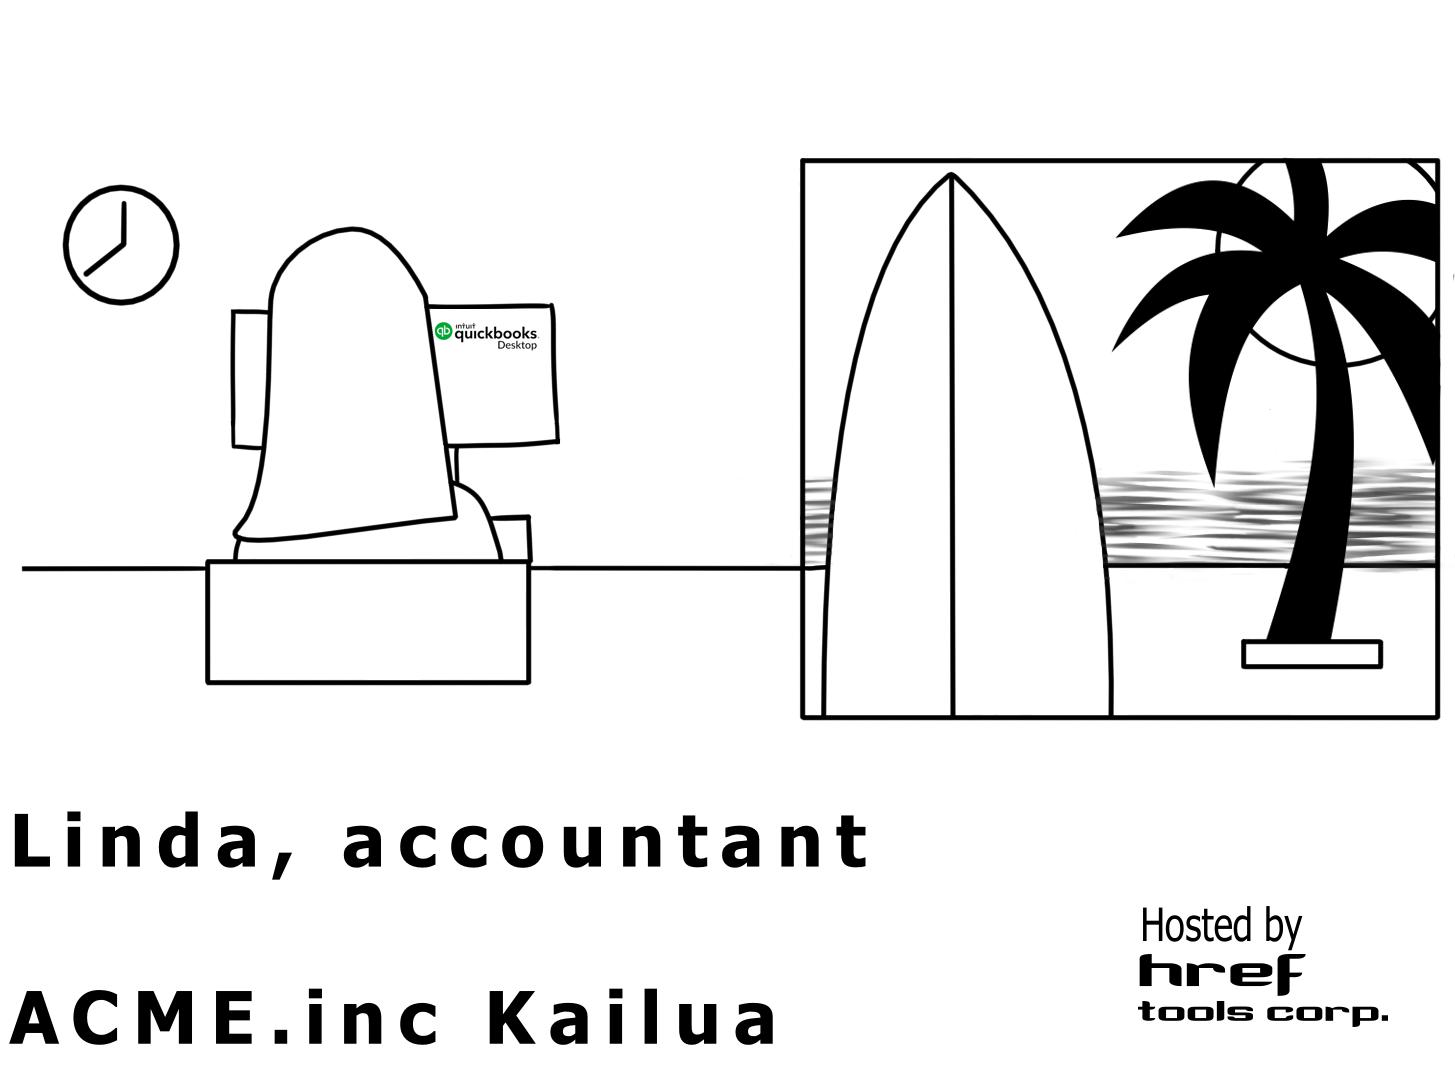 Linda working in Kailua